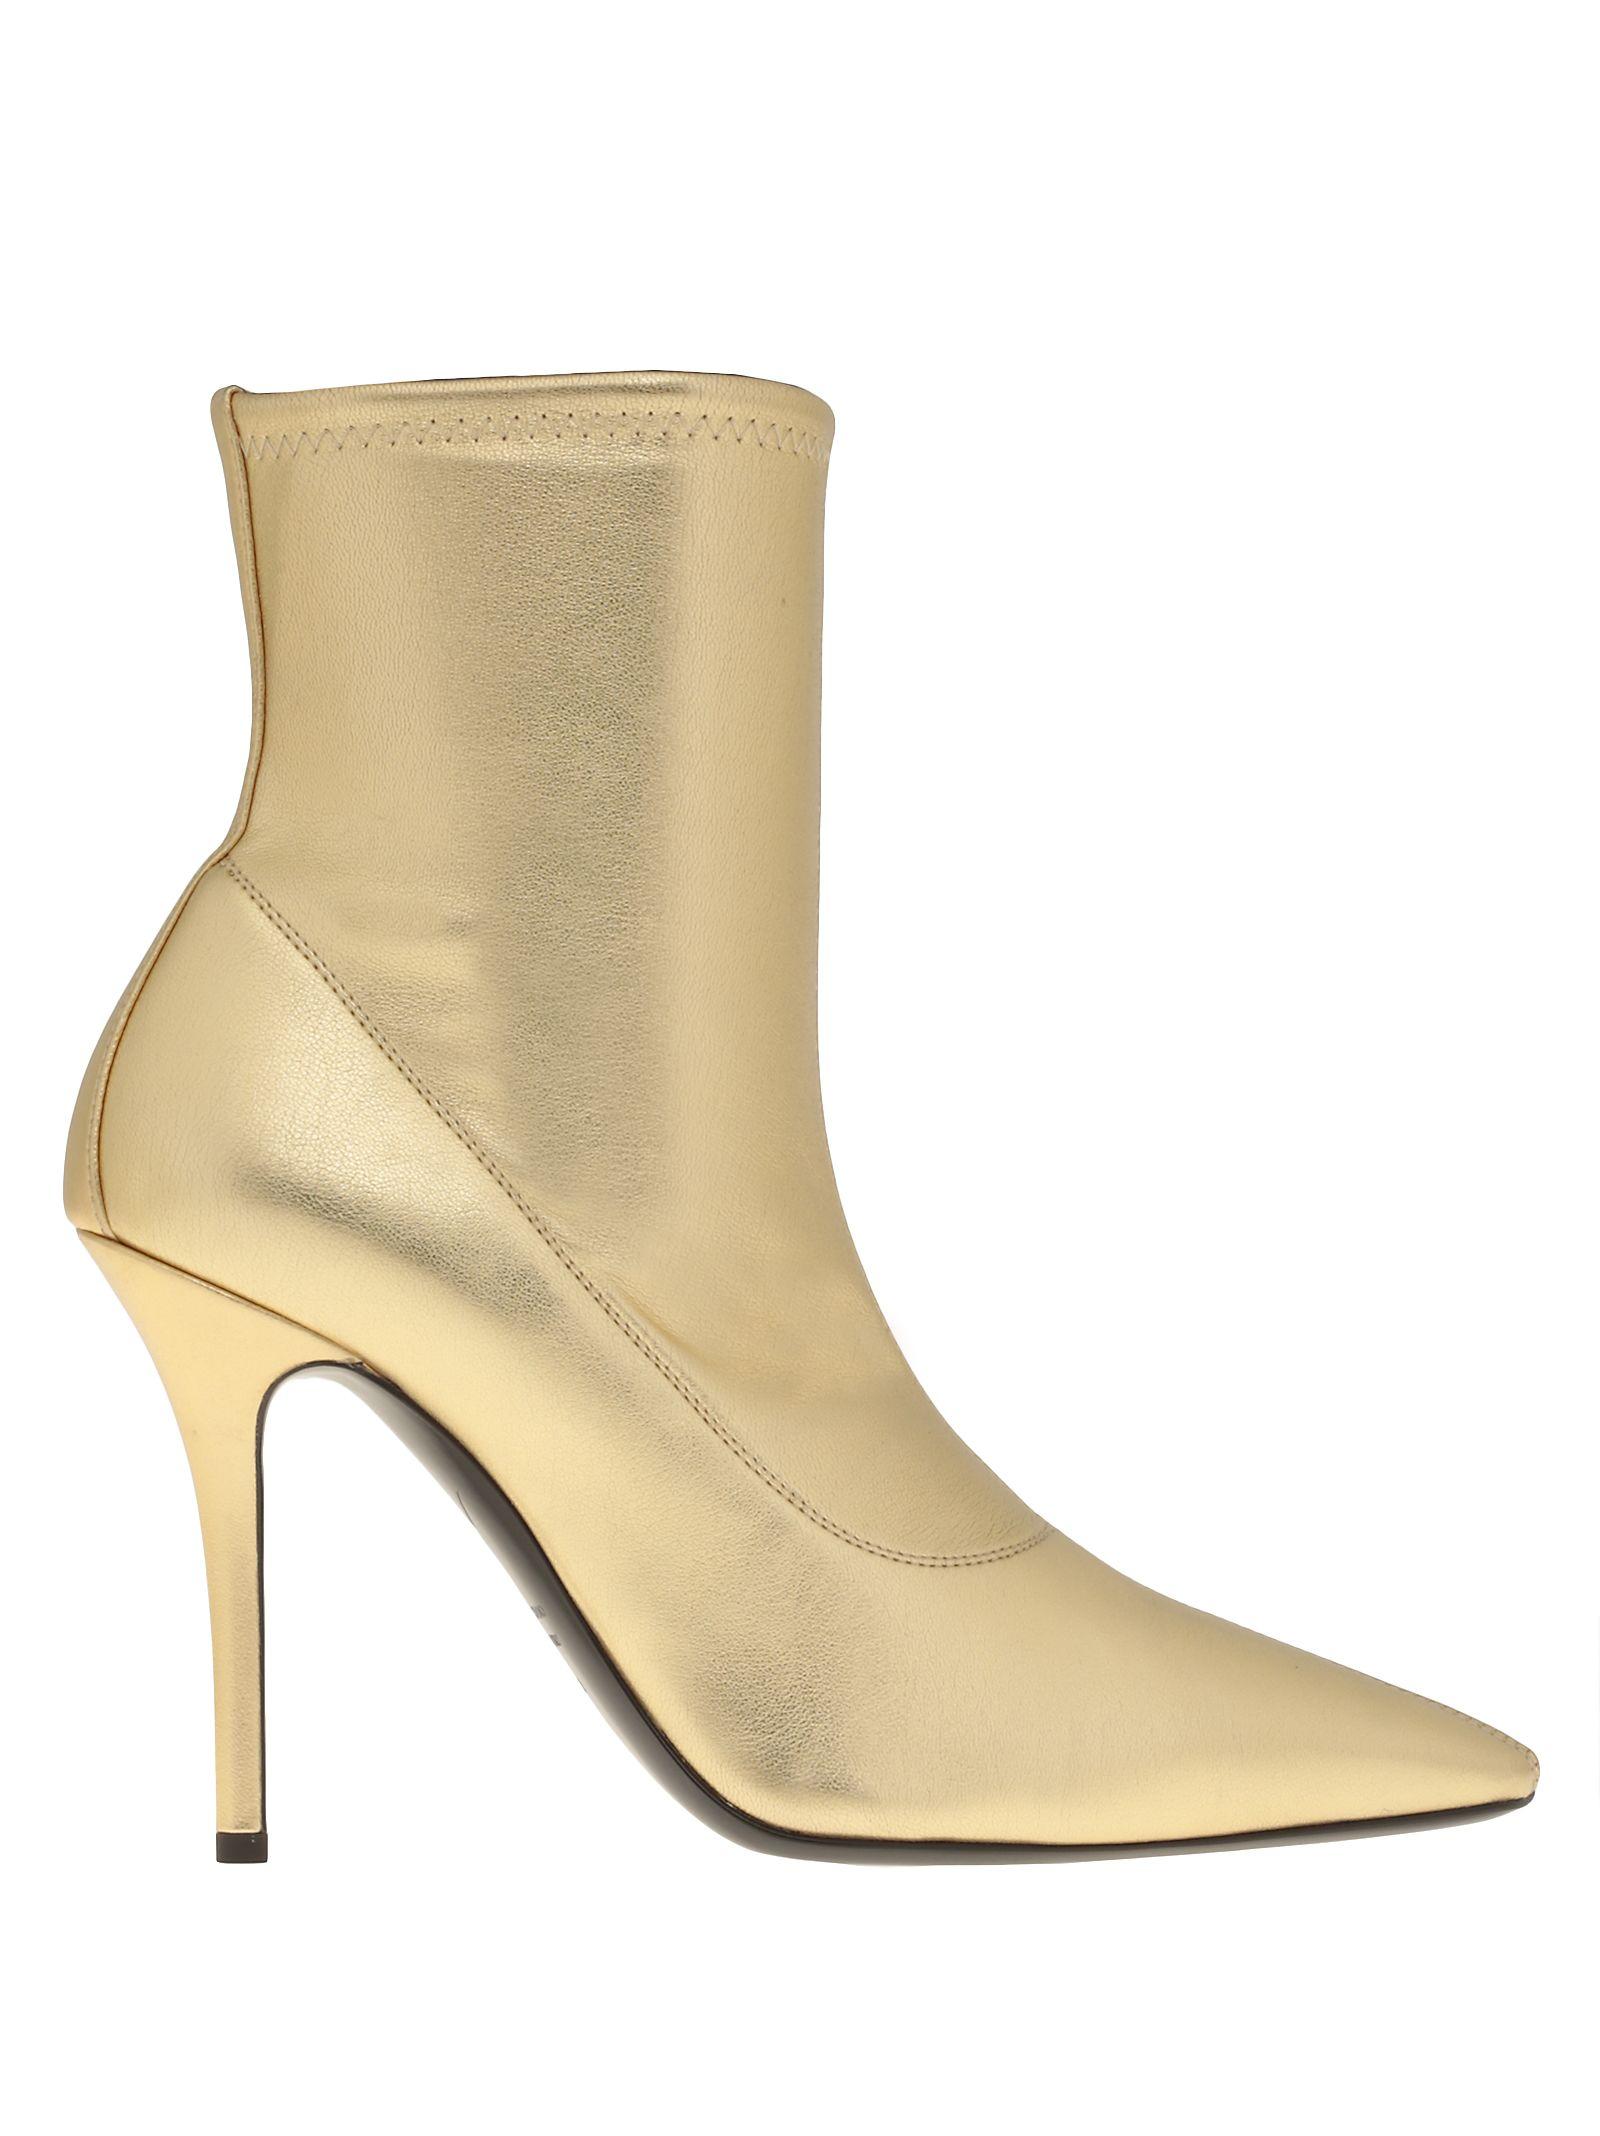 Giuseppe Zanotti Giuseppe Zanotti Salome Boot - Gold - 10820014 | italist